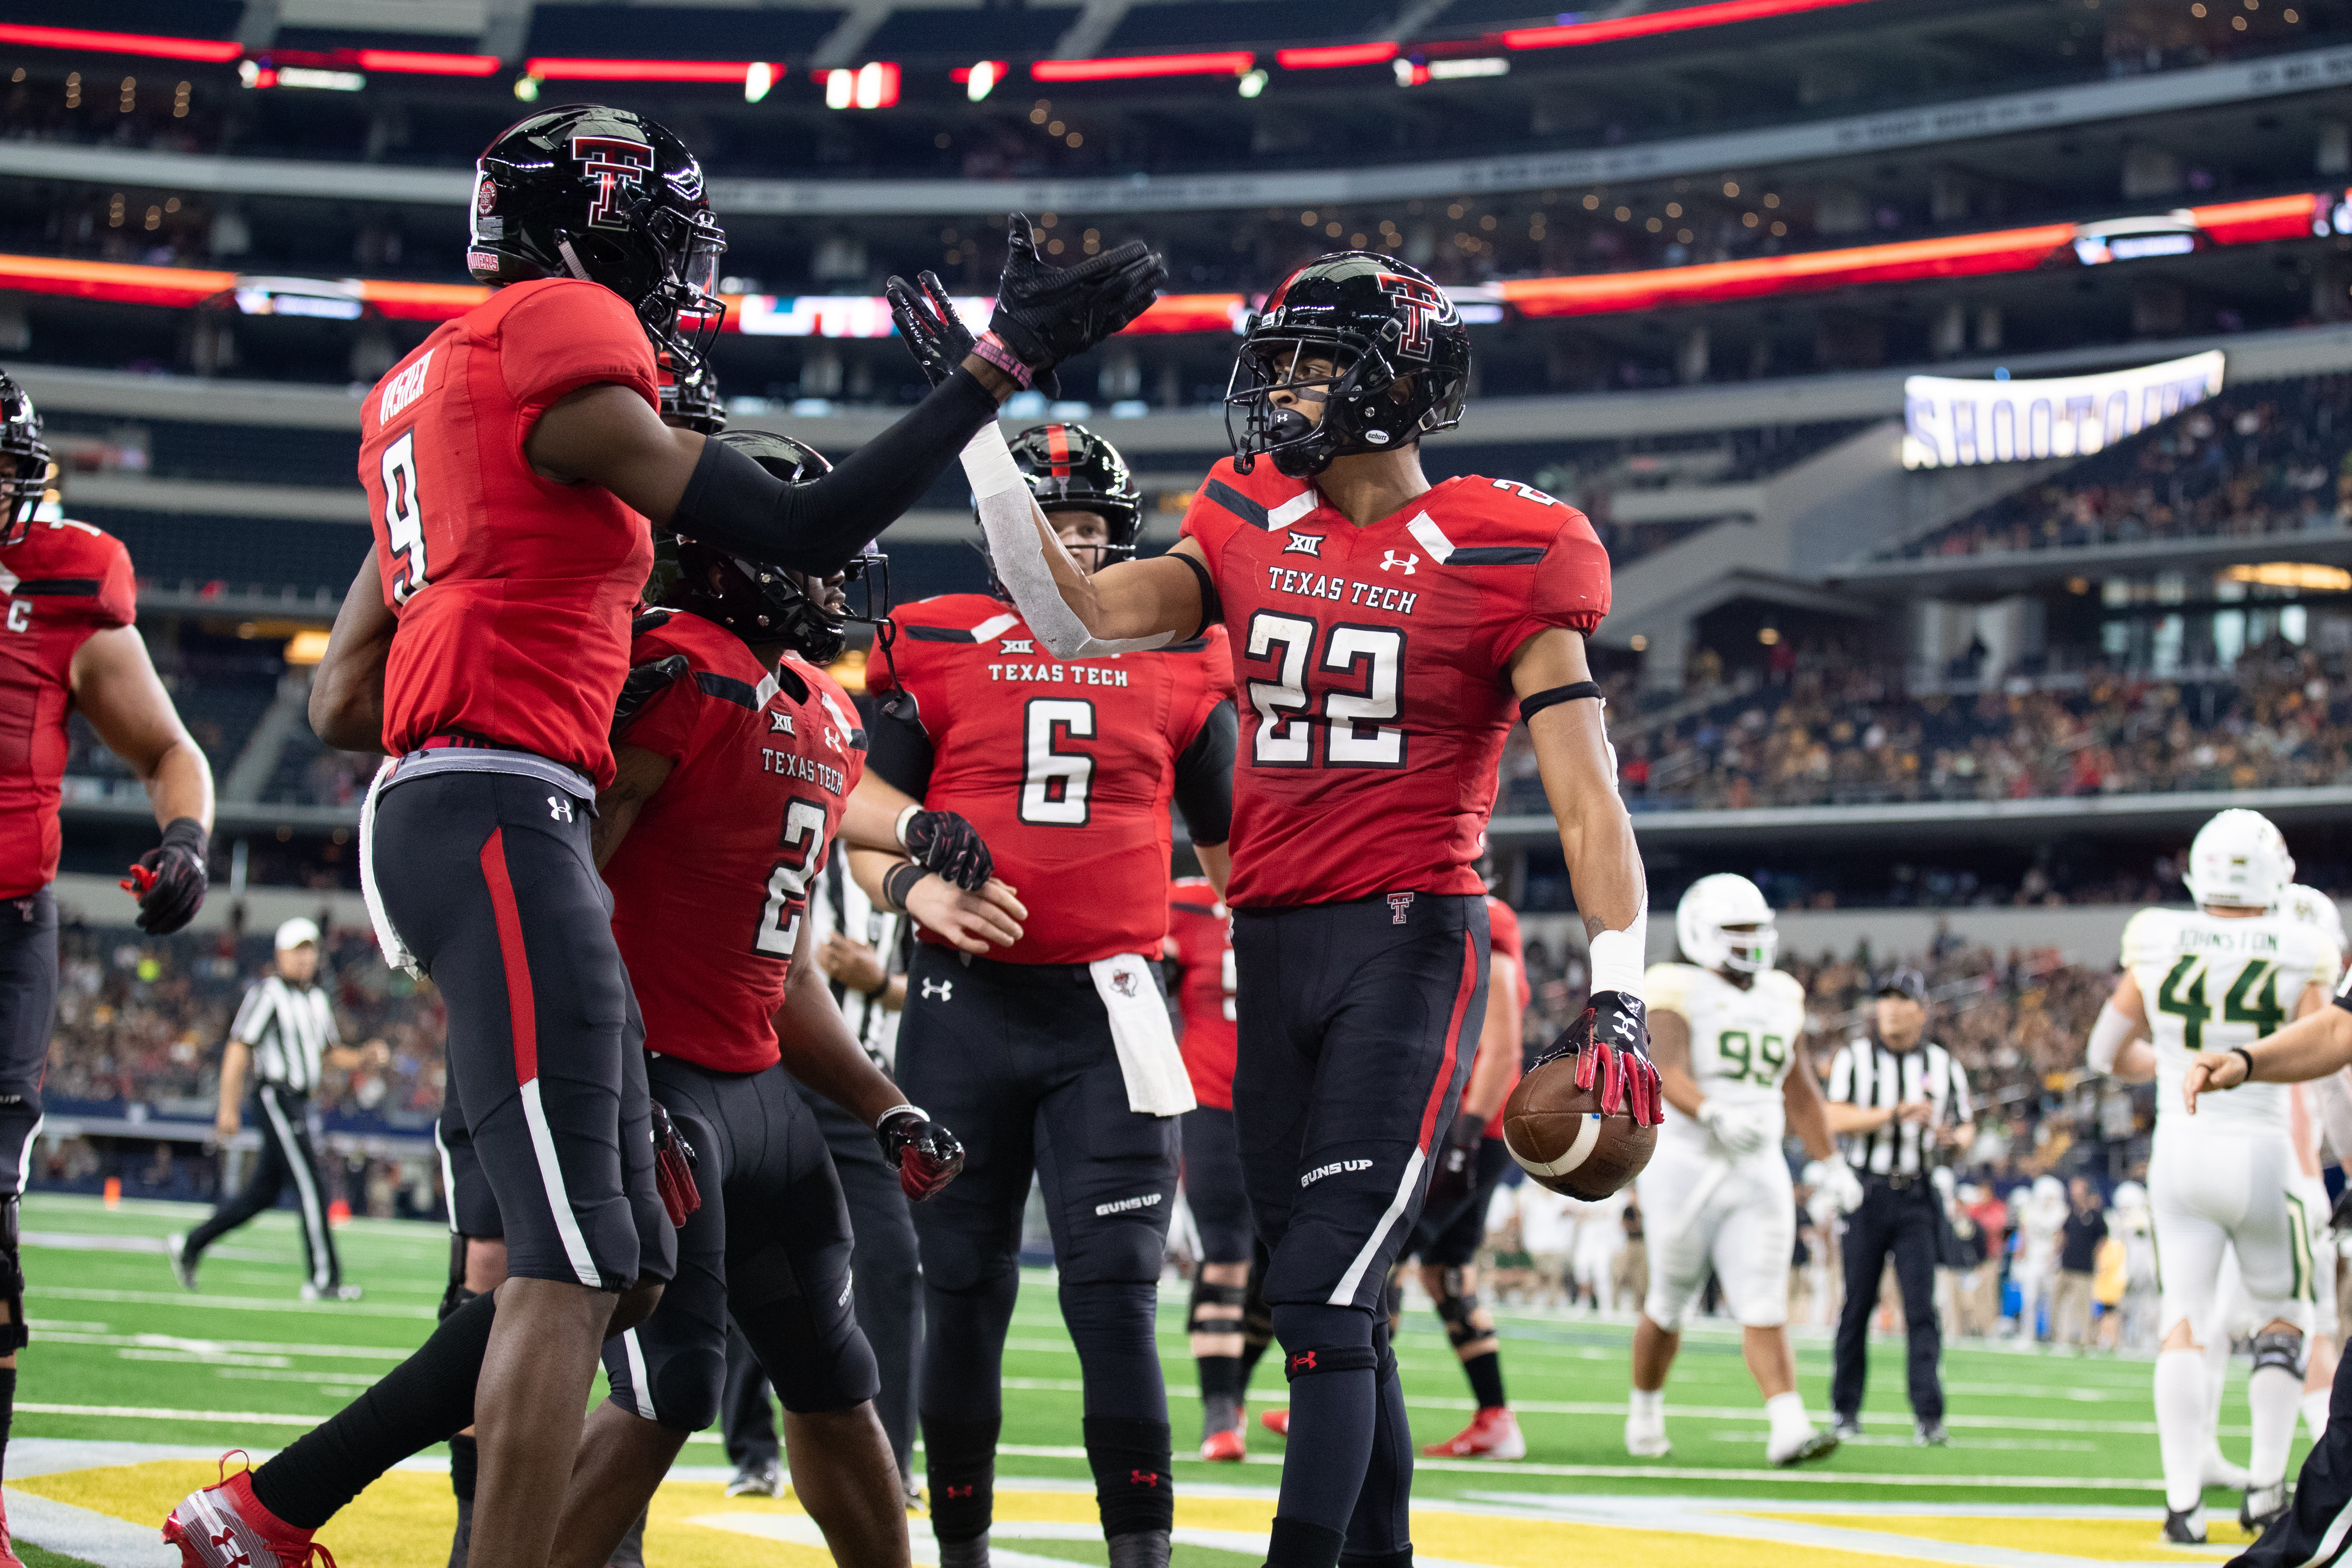 Viva The Matadors, a Texas Tech Red Raiders community